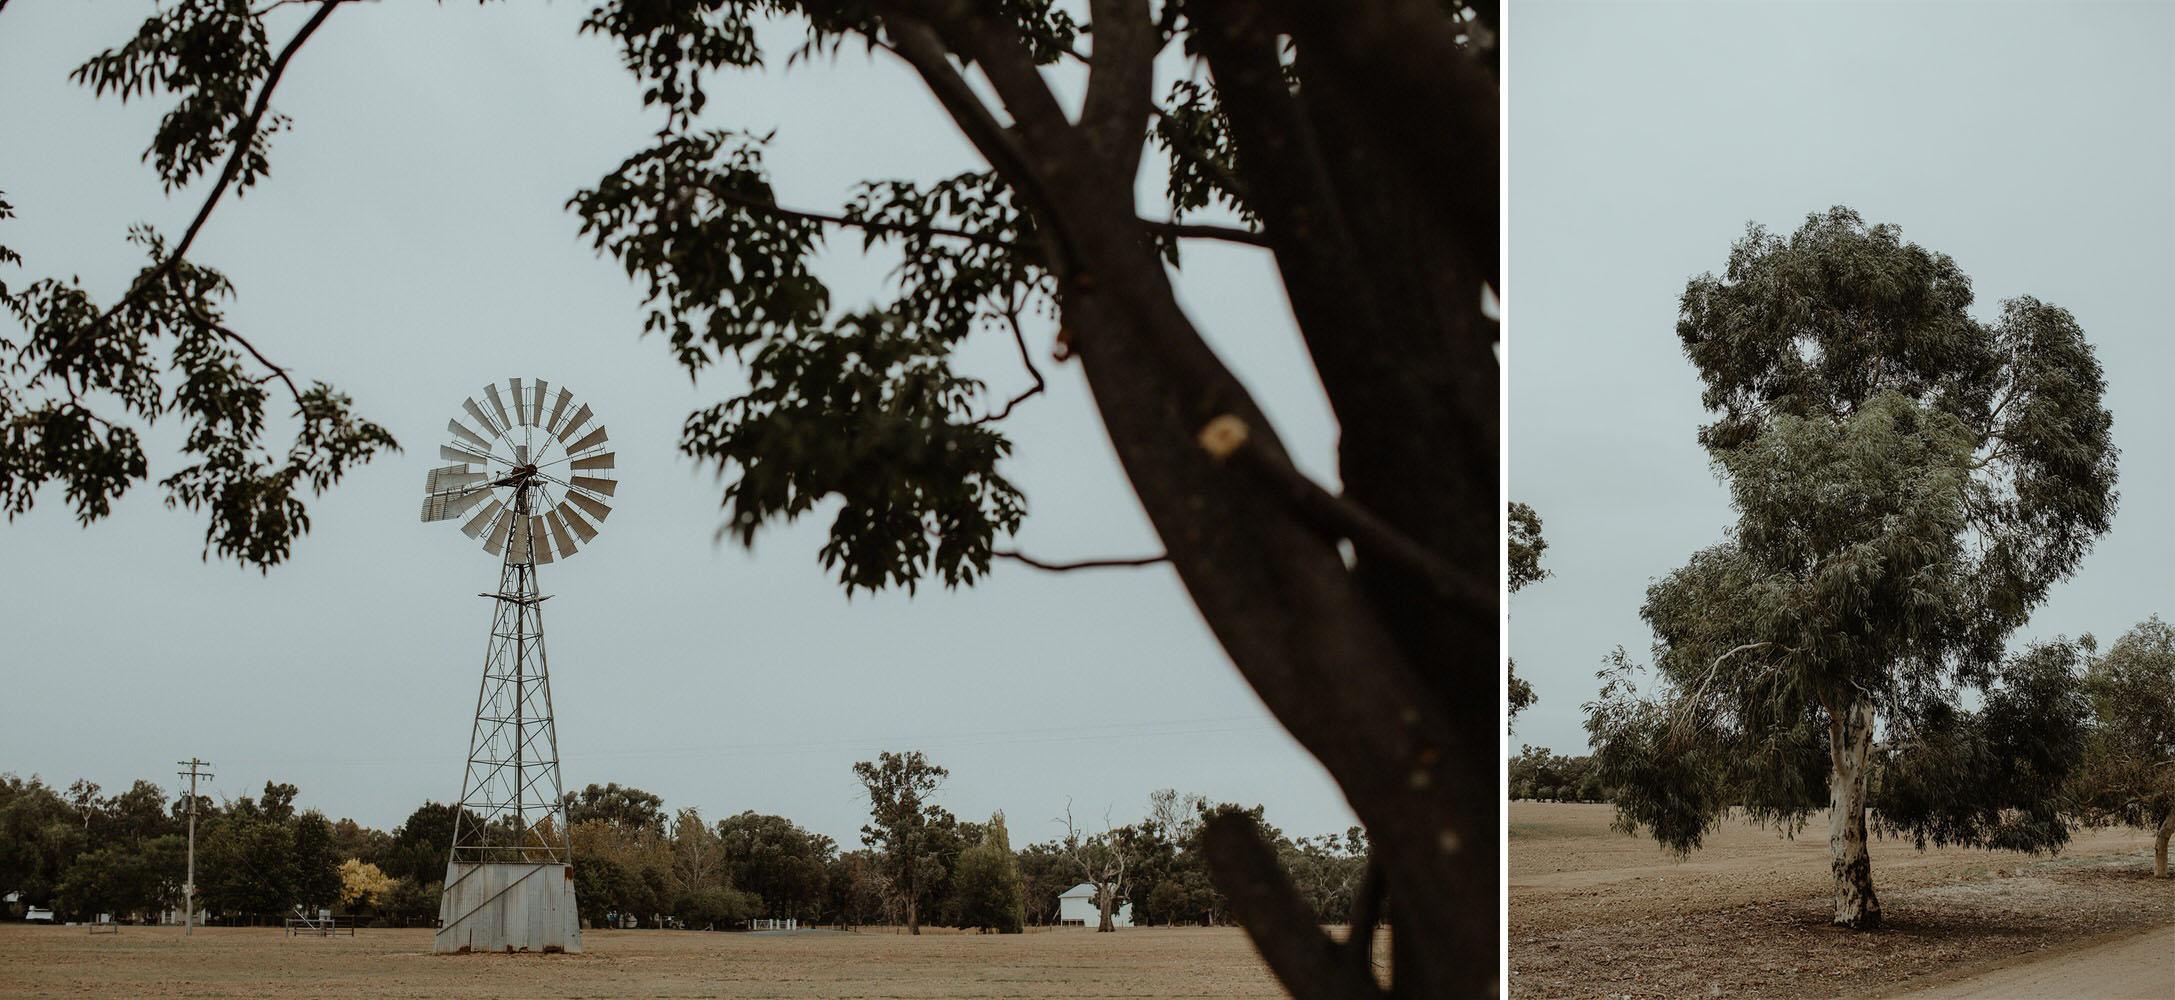 round-hill-homestead-culcairn-wedding-18.jpg